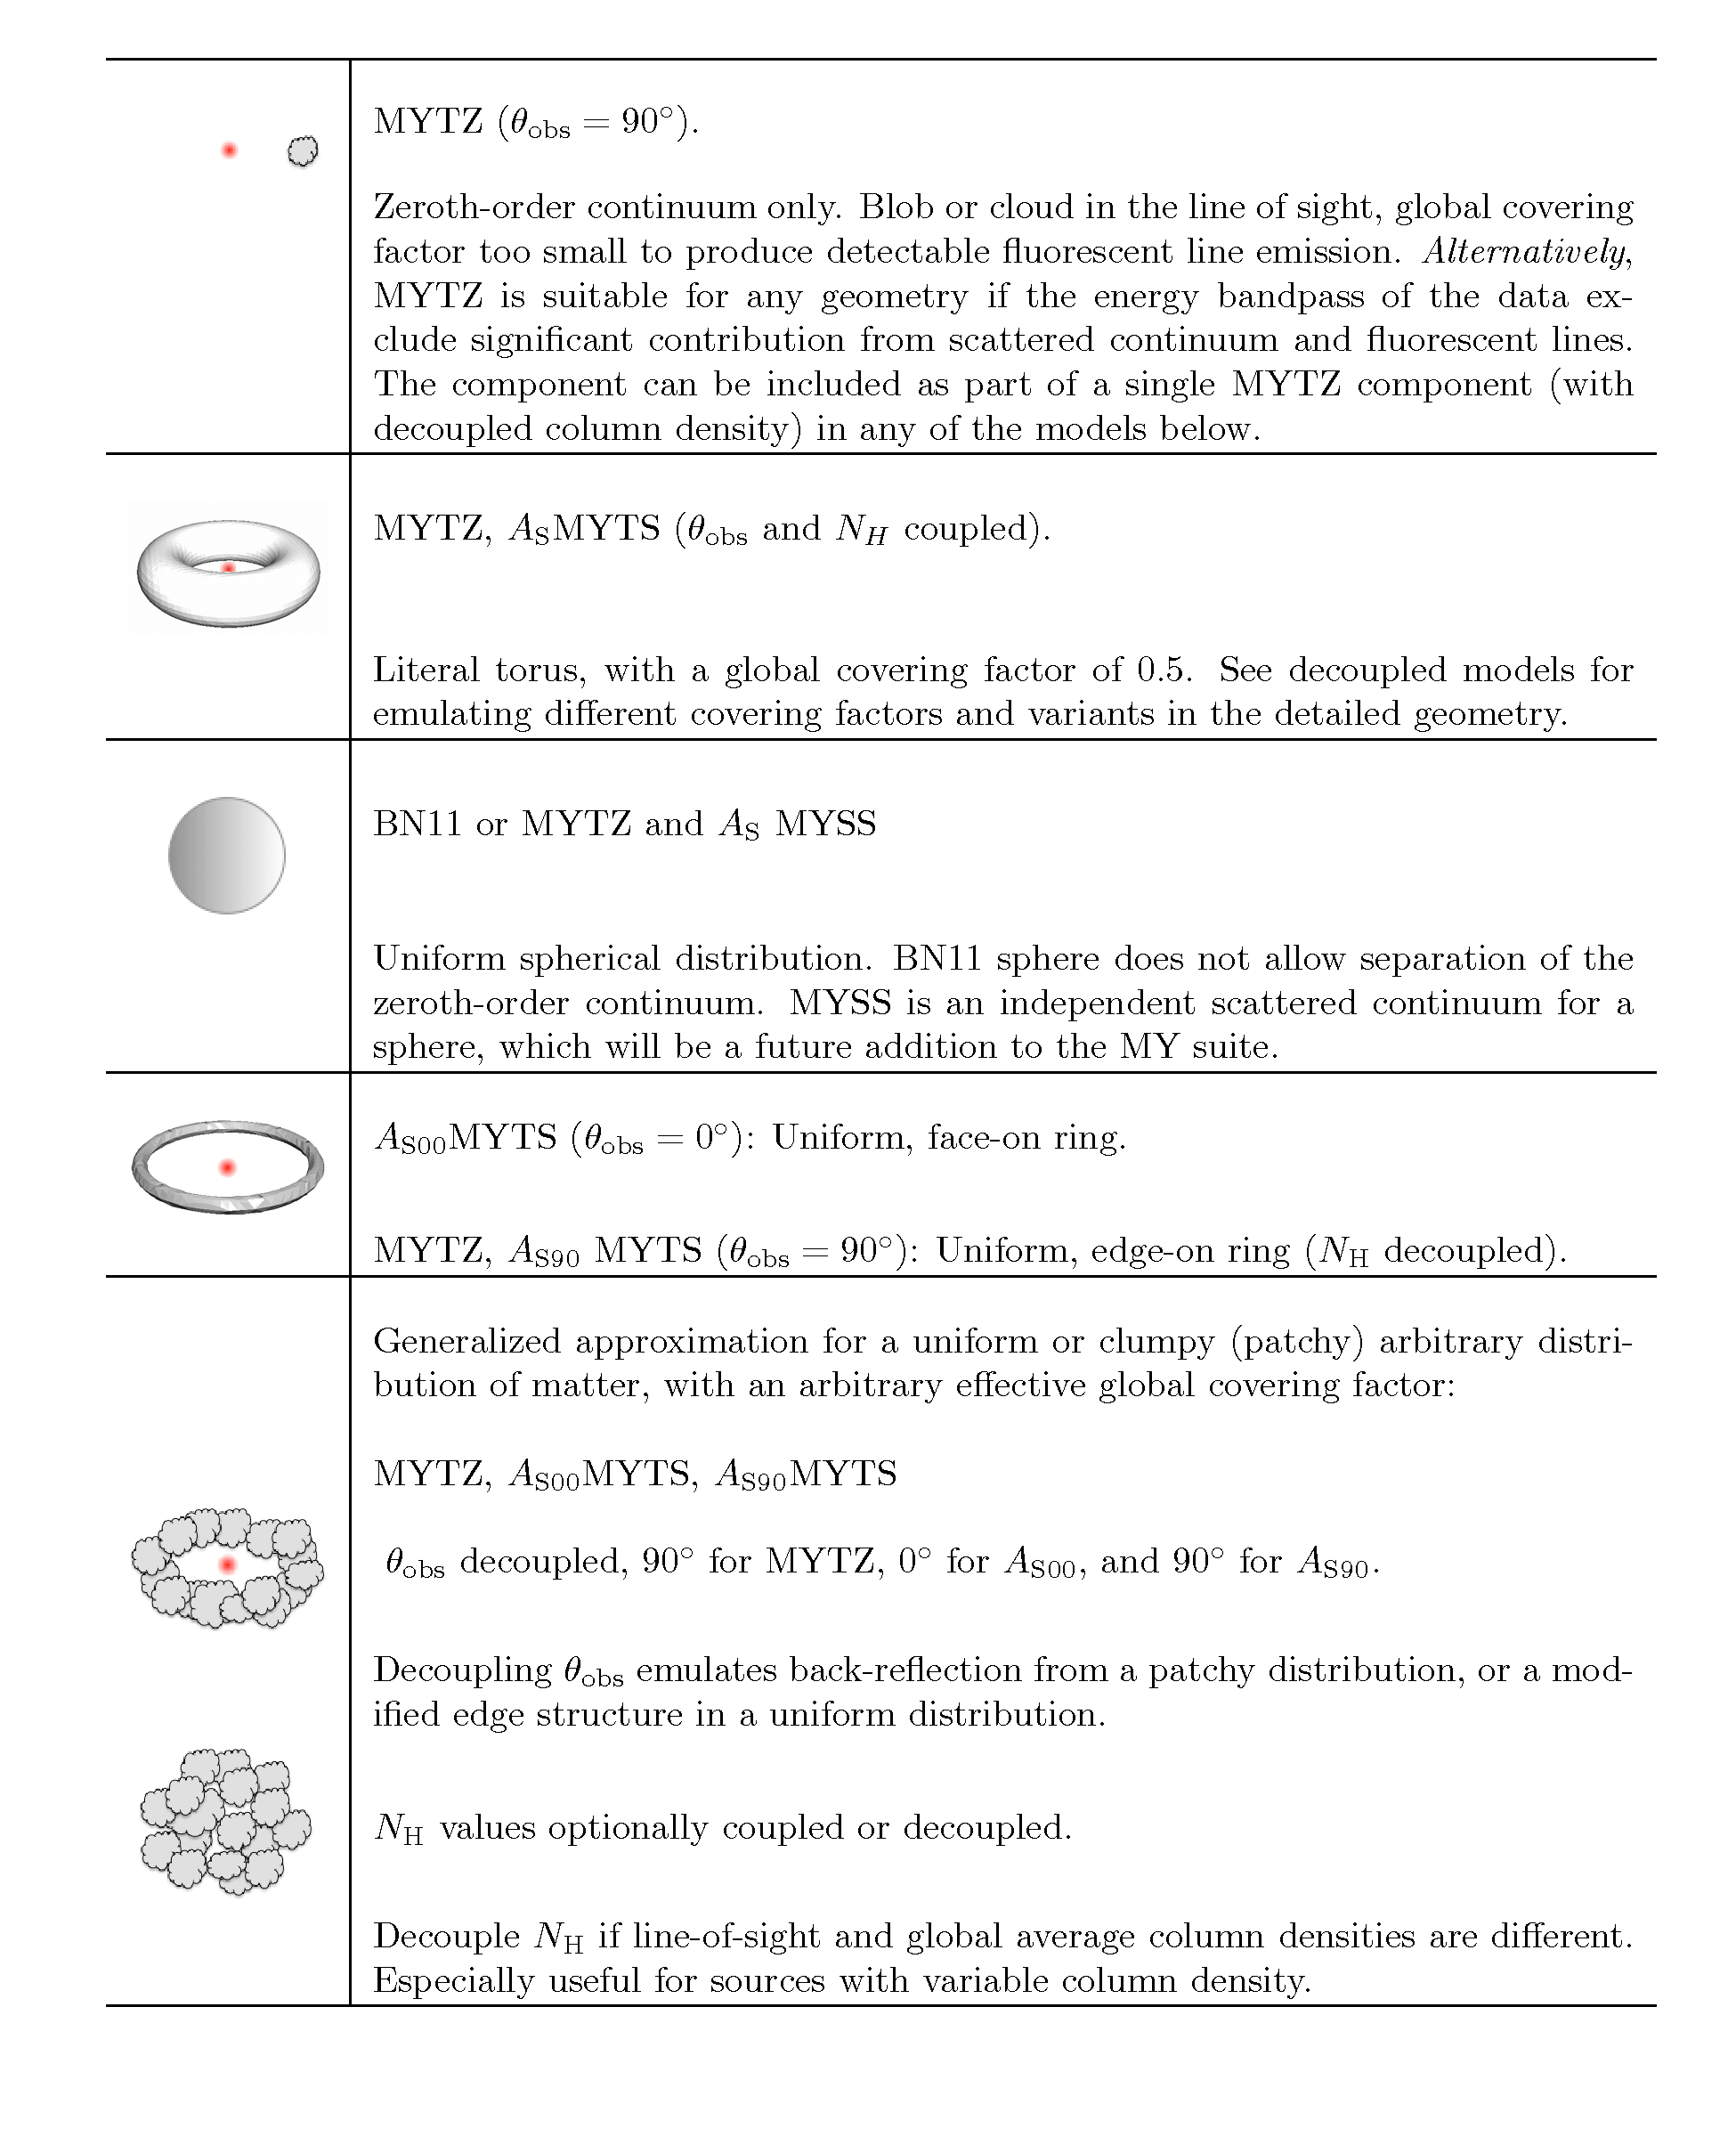 MYTorusi XSPEC model: table illustrating different modes of use